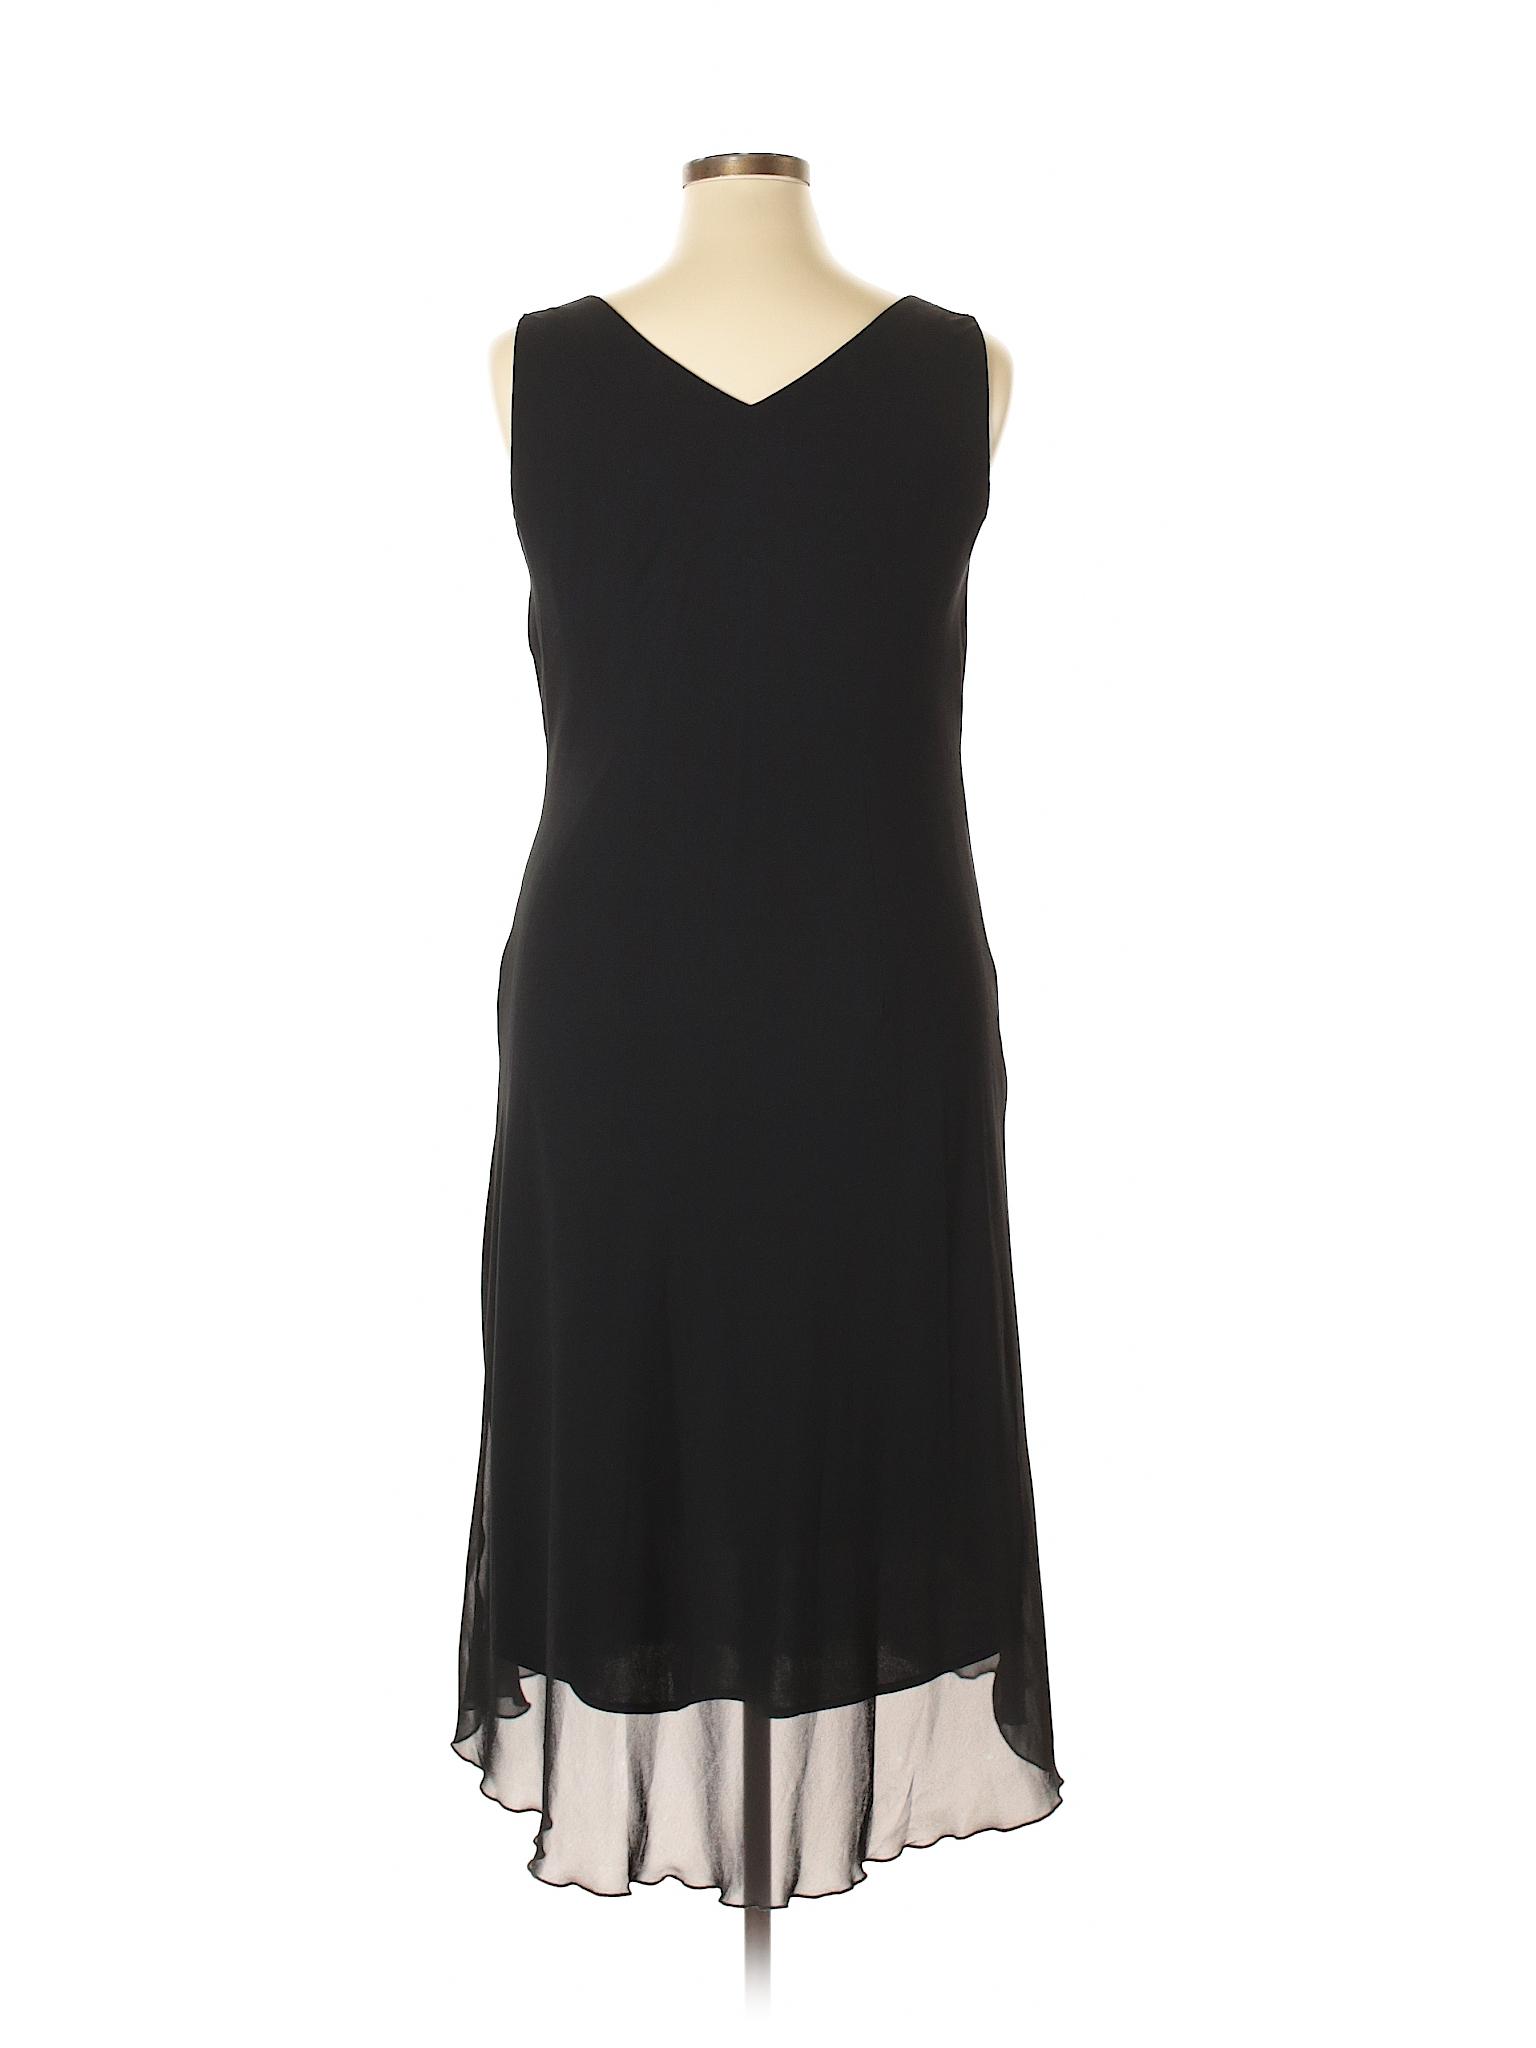 16ca8a7adf55e Cocktail Dress | Products | Dresses, Dress barn dresses, Size 14 dresses